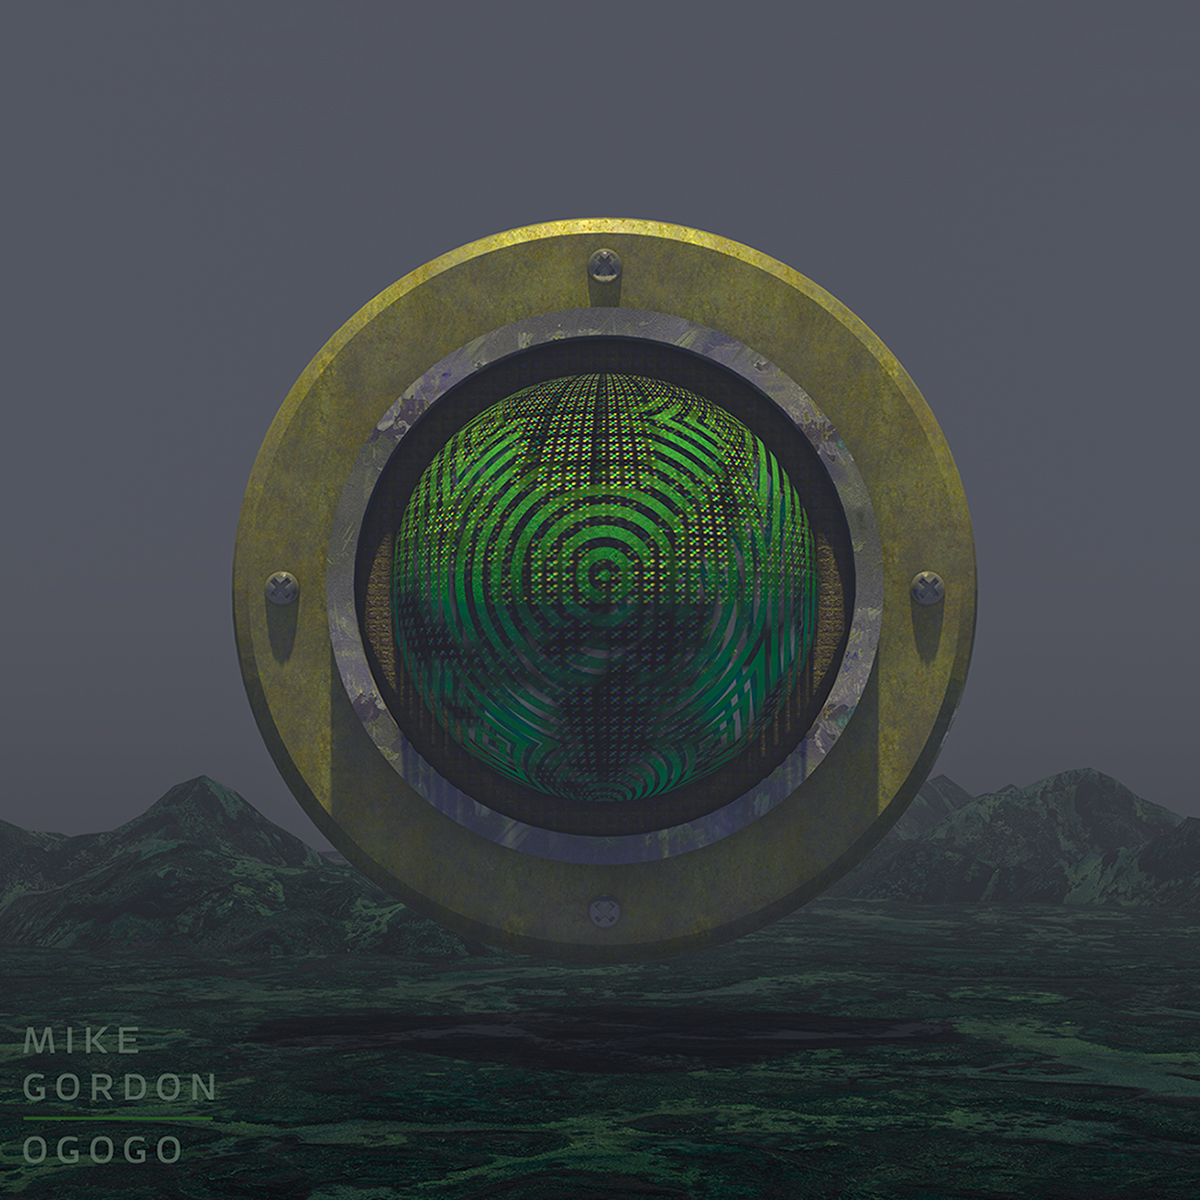 Mike Gordon OGOGO Download